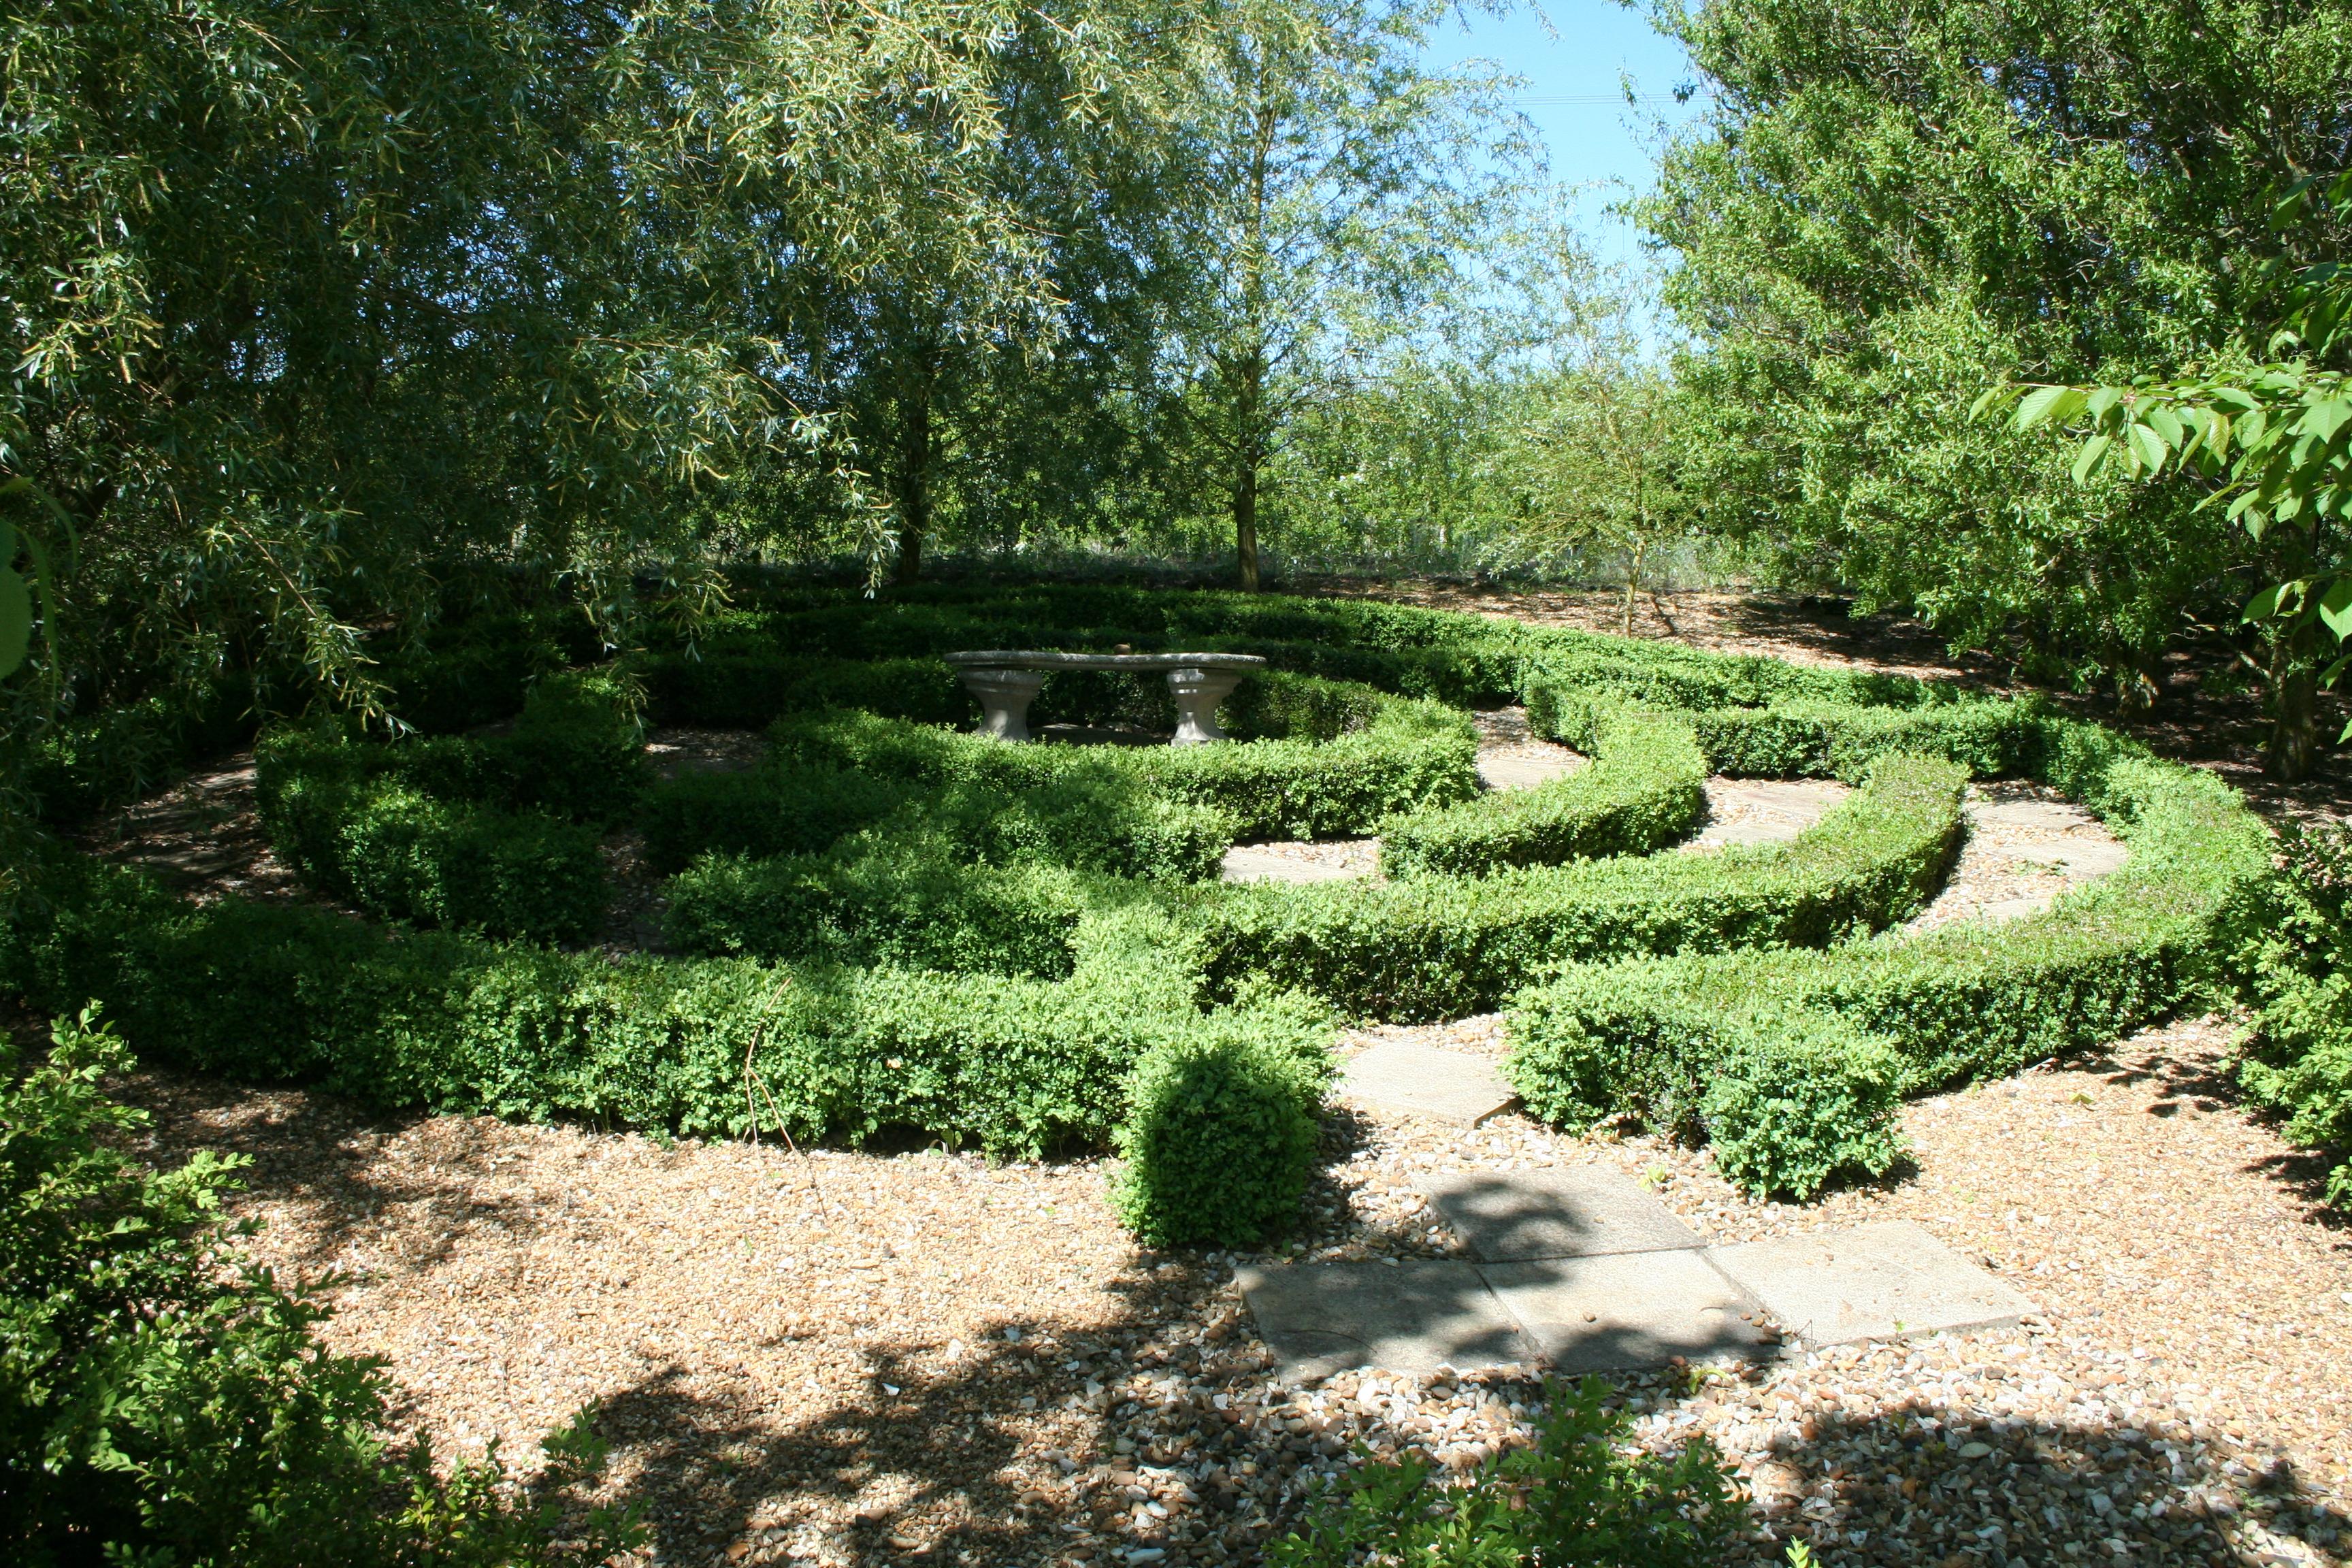 Dwarf Box plants creating a maze